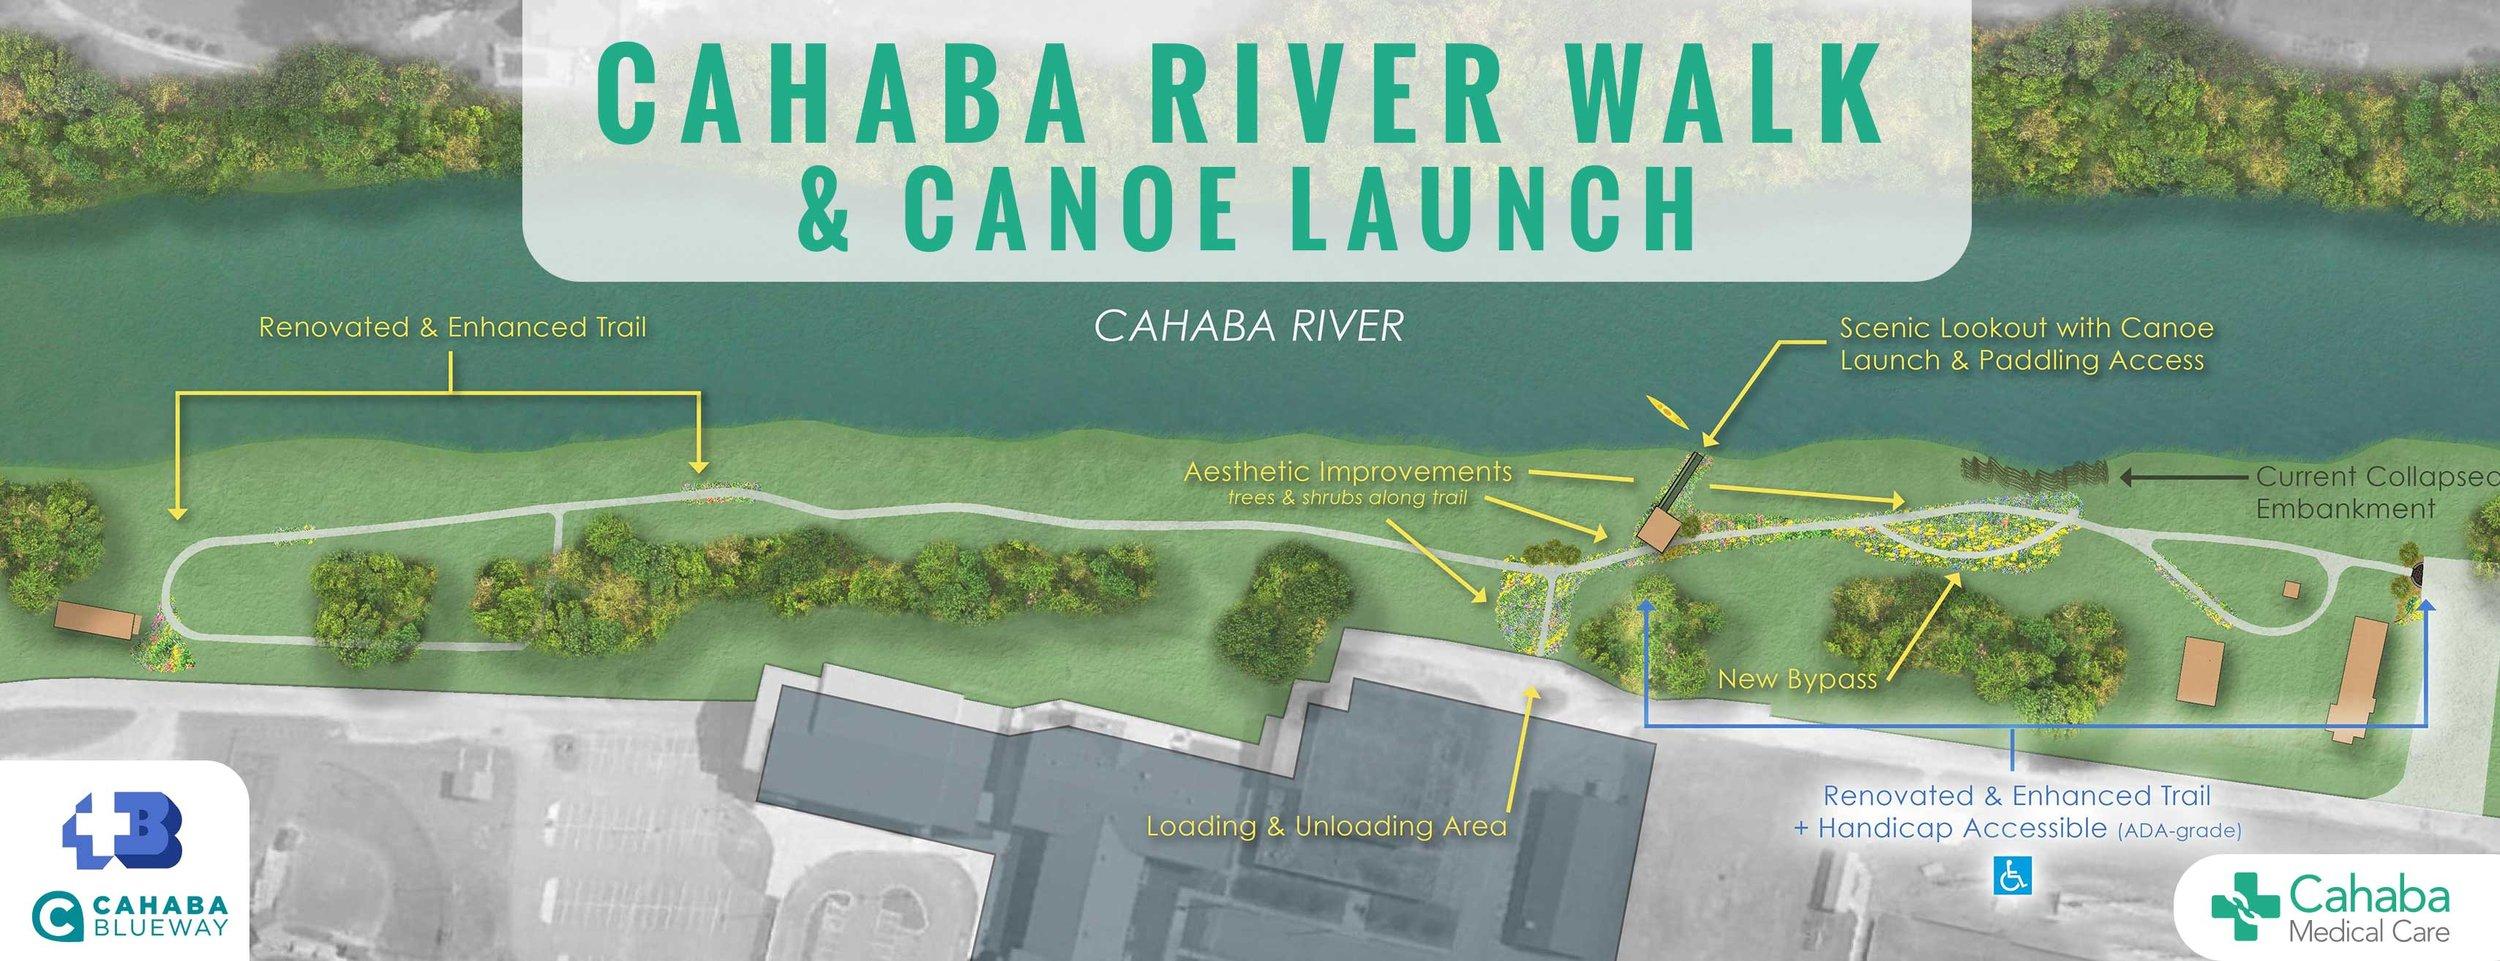 River-Walk-Facebook-Banner.jpg